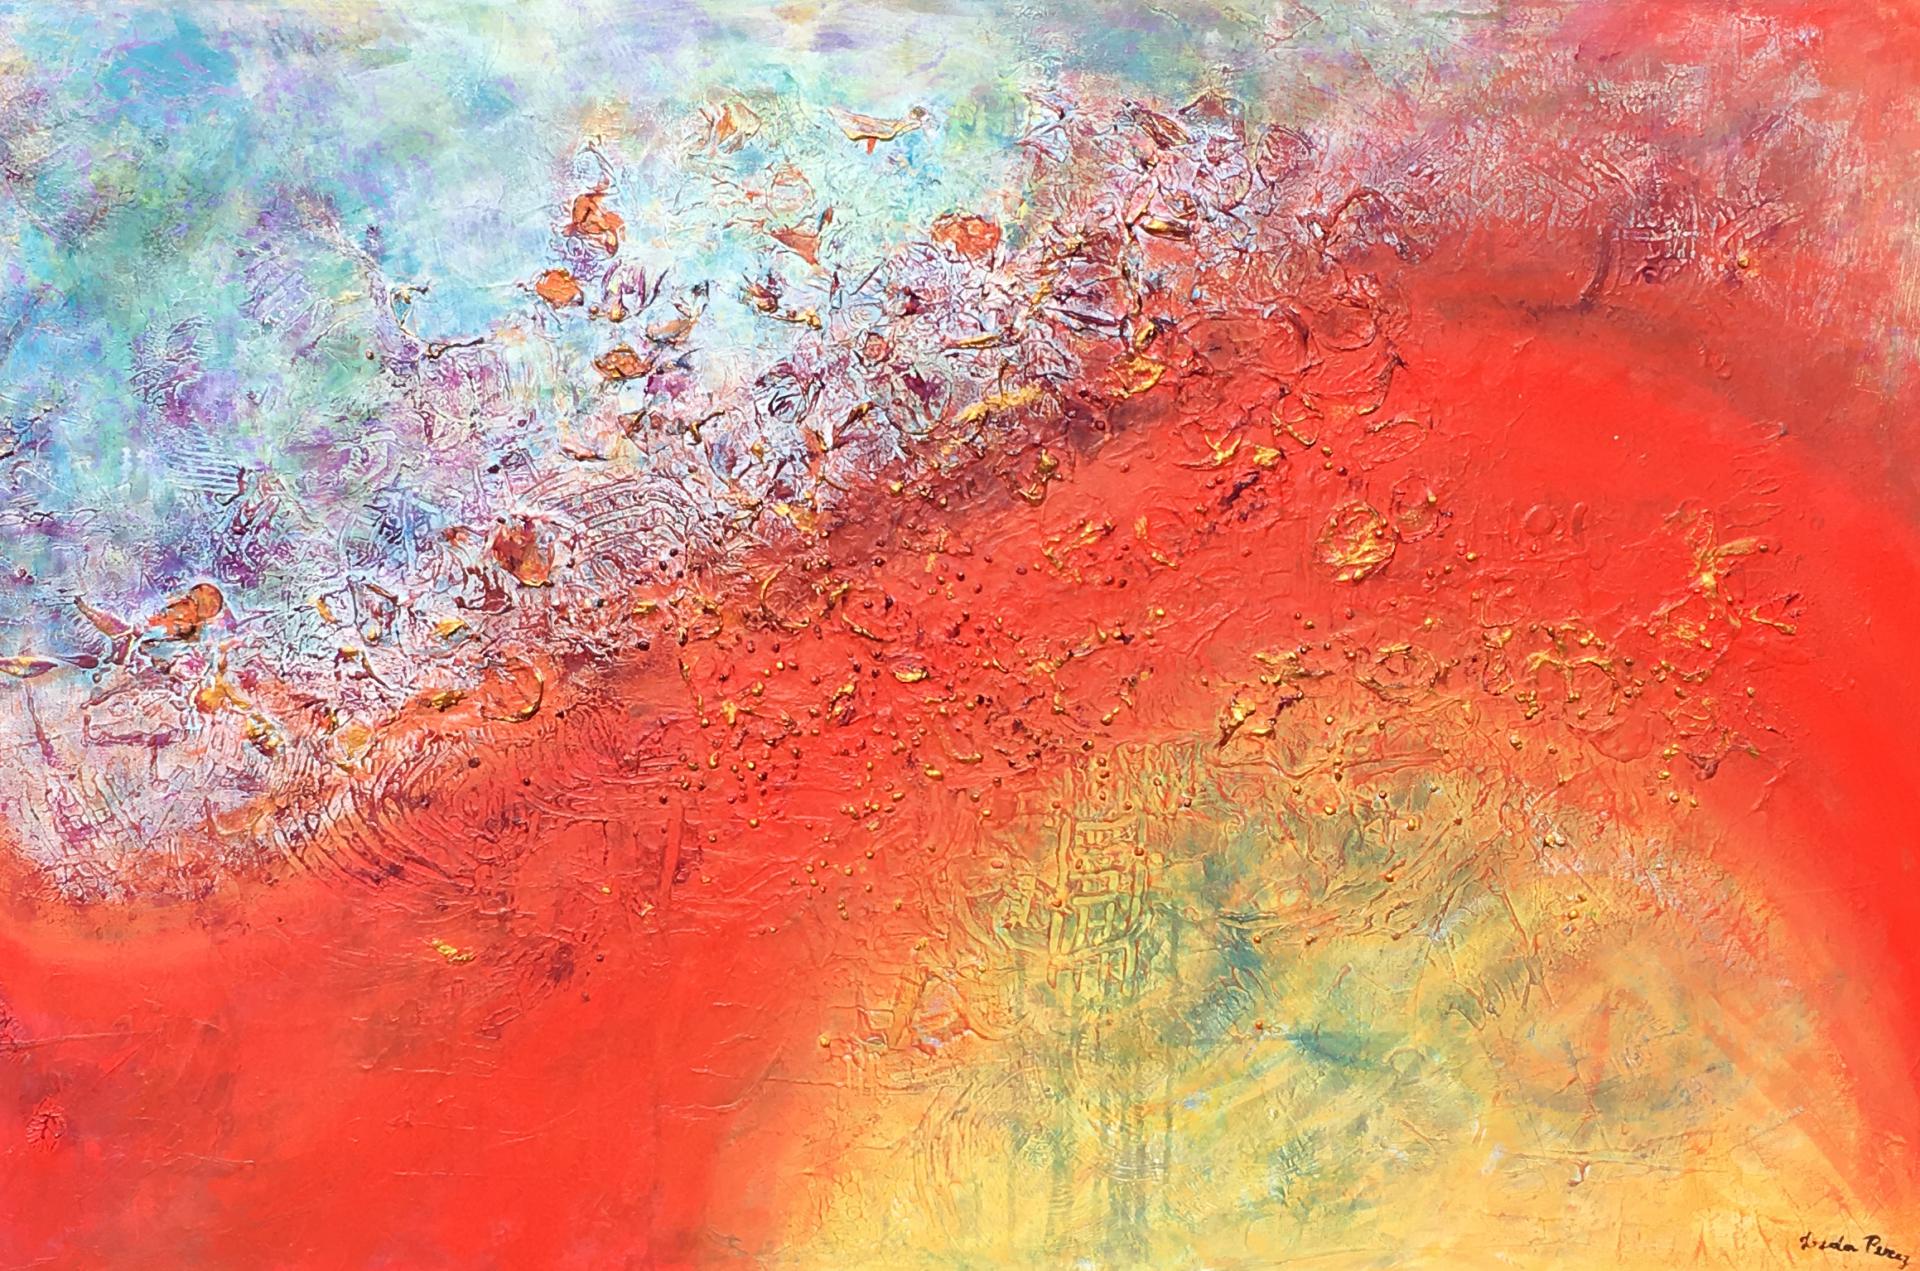 Arc-en-Ciel Artists Leda Risse Painting Fabled Gallery https://fabledgallery.art/product/arc-en-ciel/